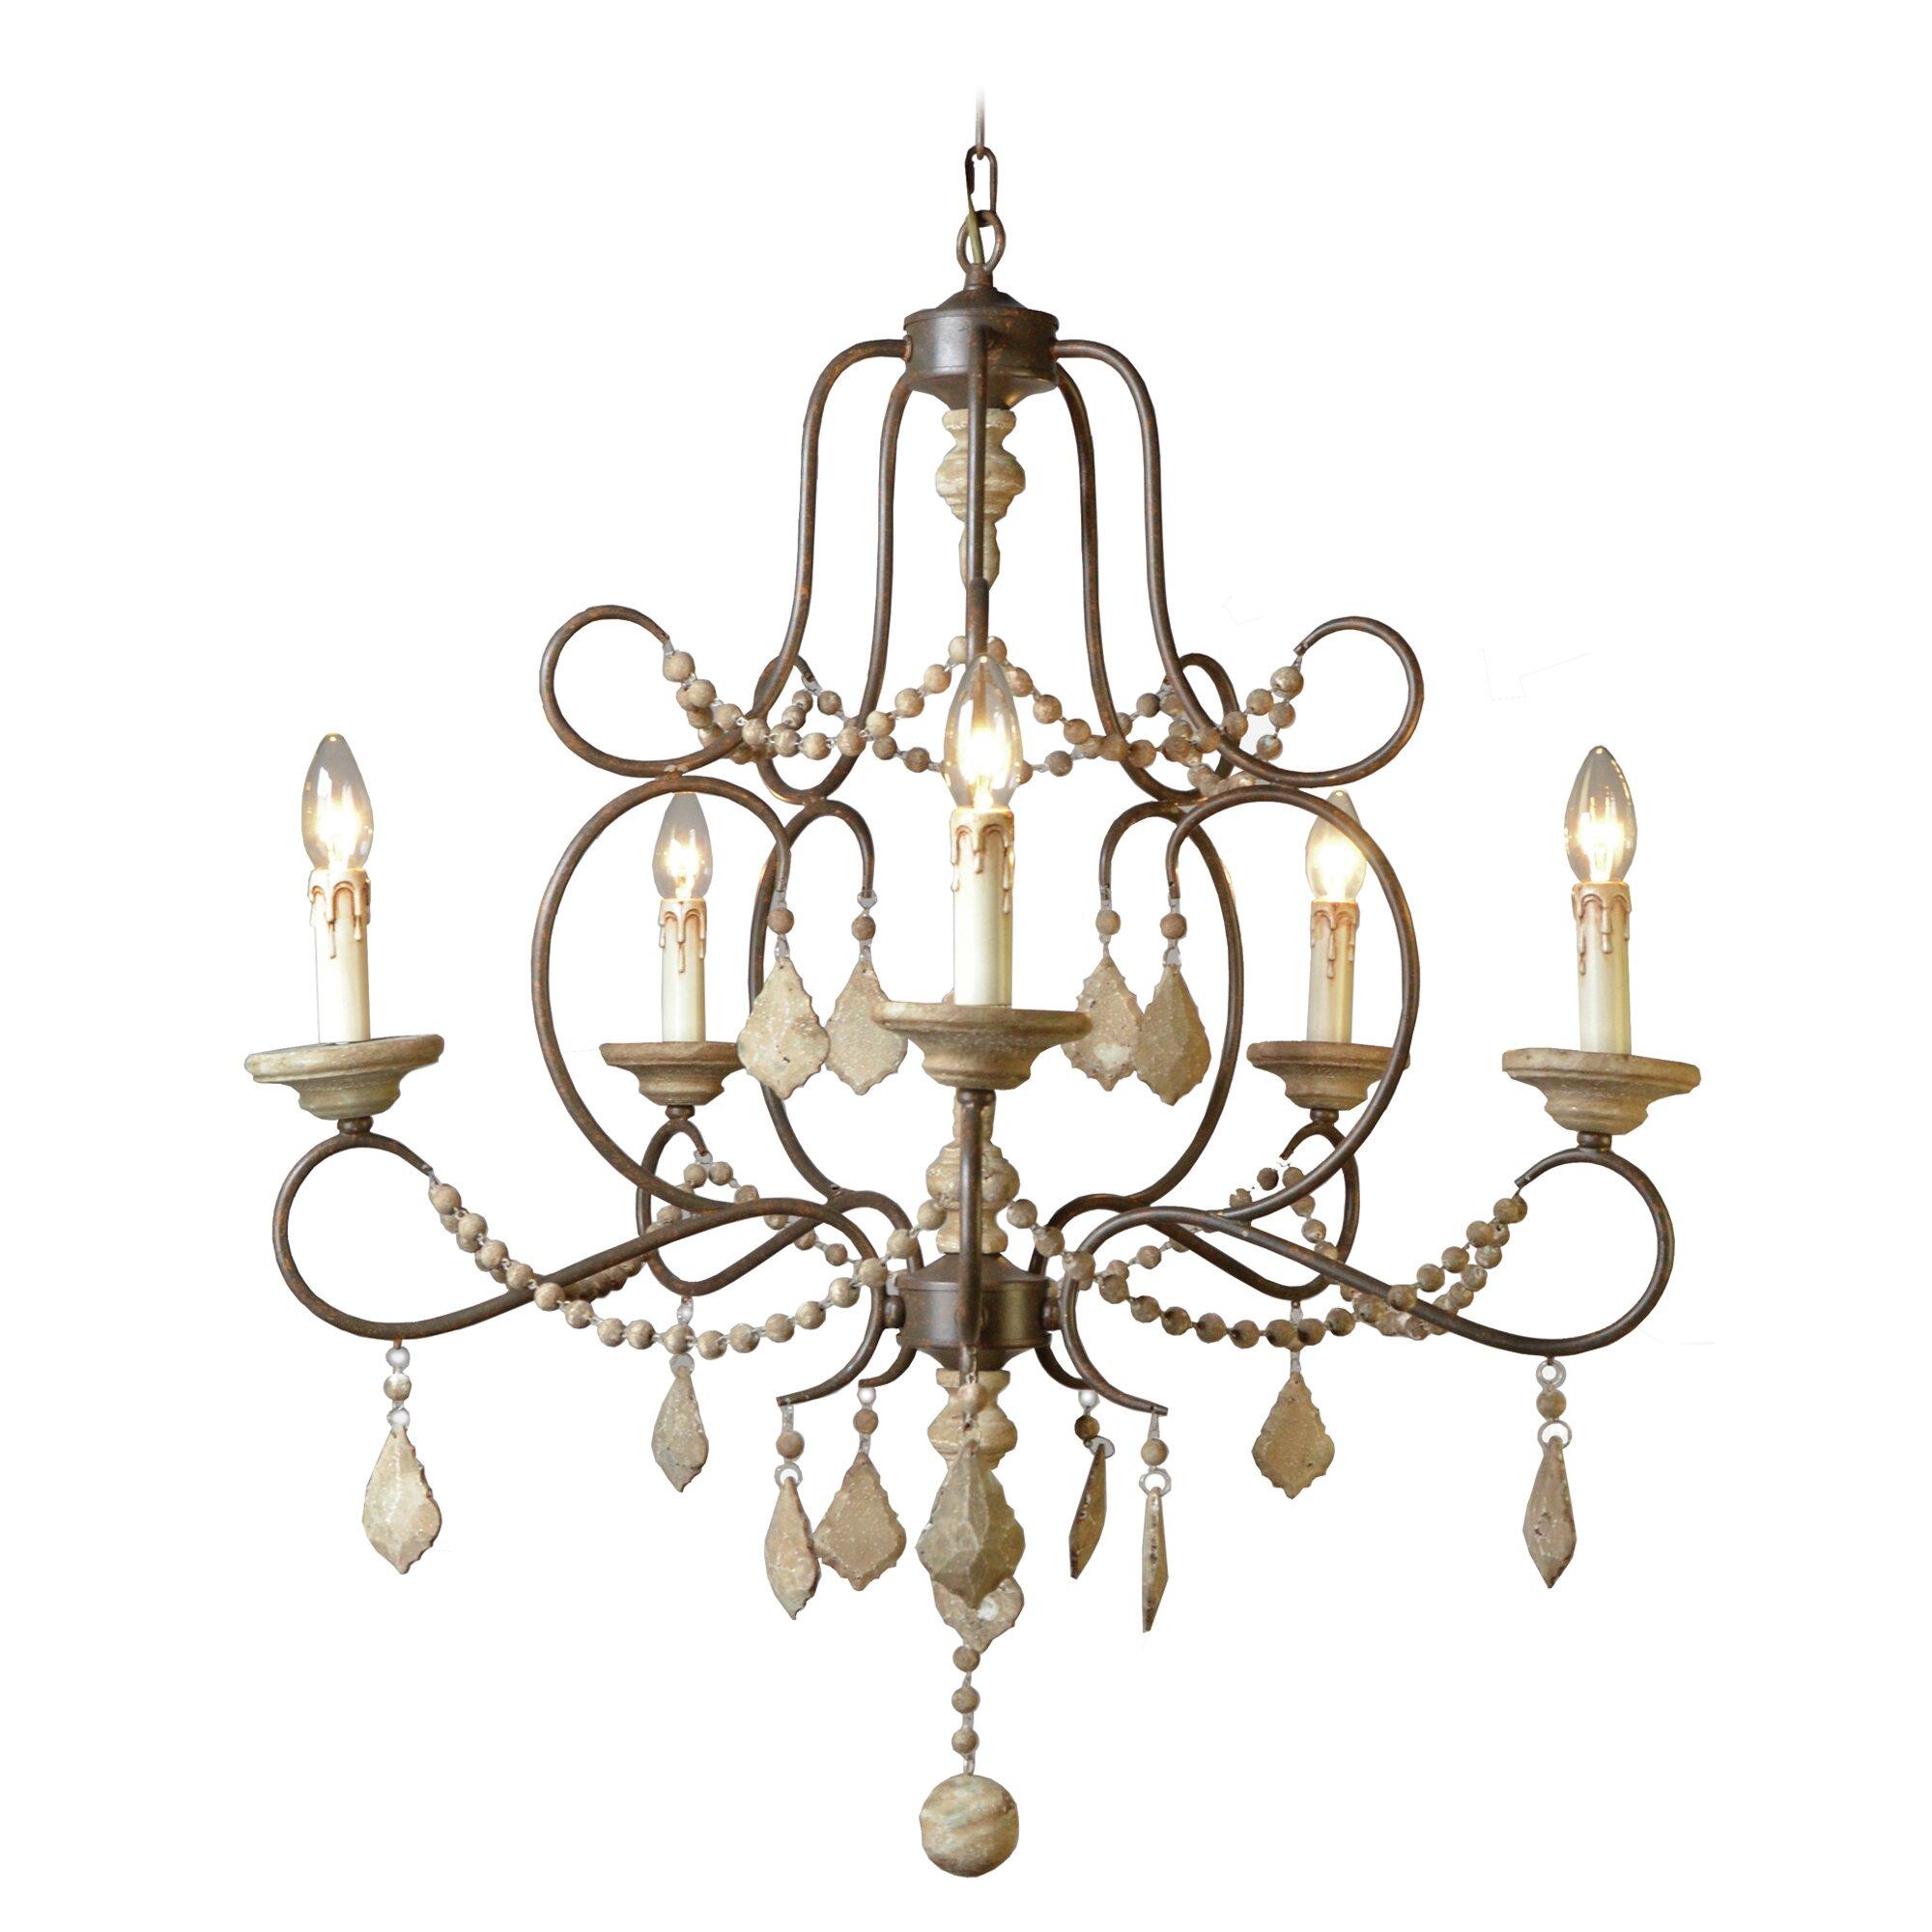 Yosemite home decor palm 6 lights crystal chandelier wayfair for Home decor survivor 6